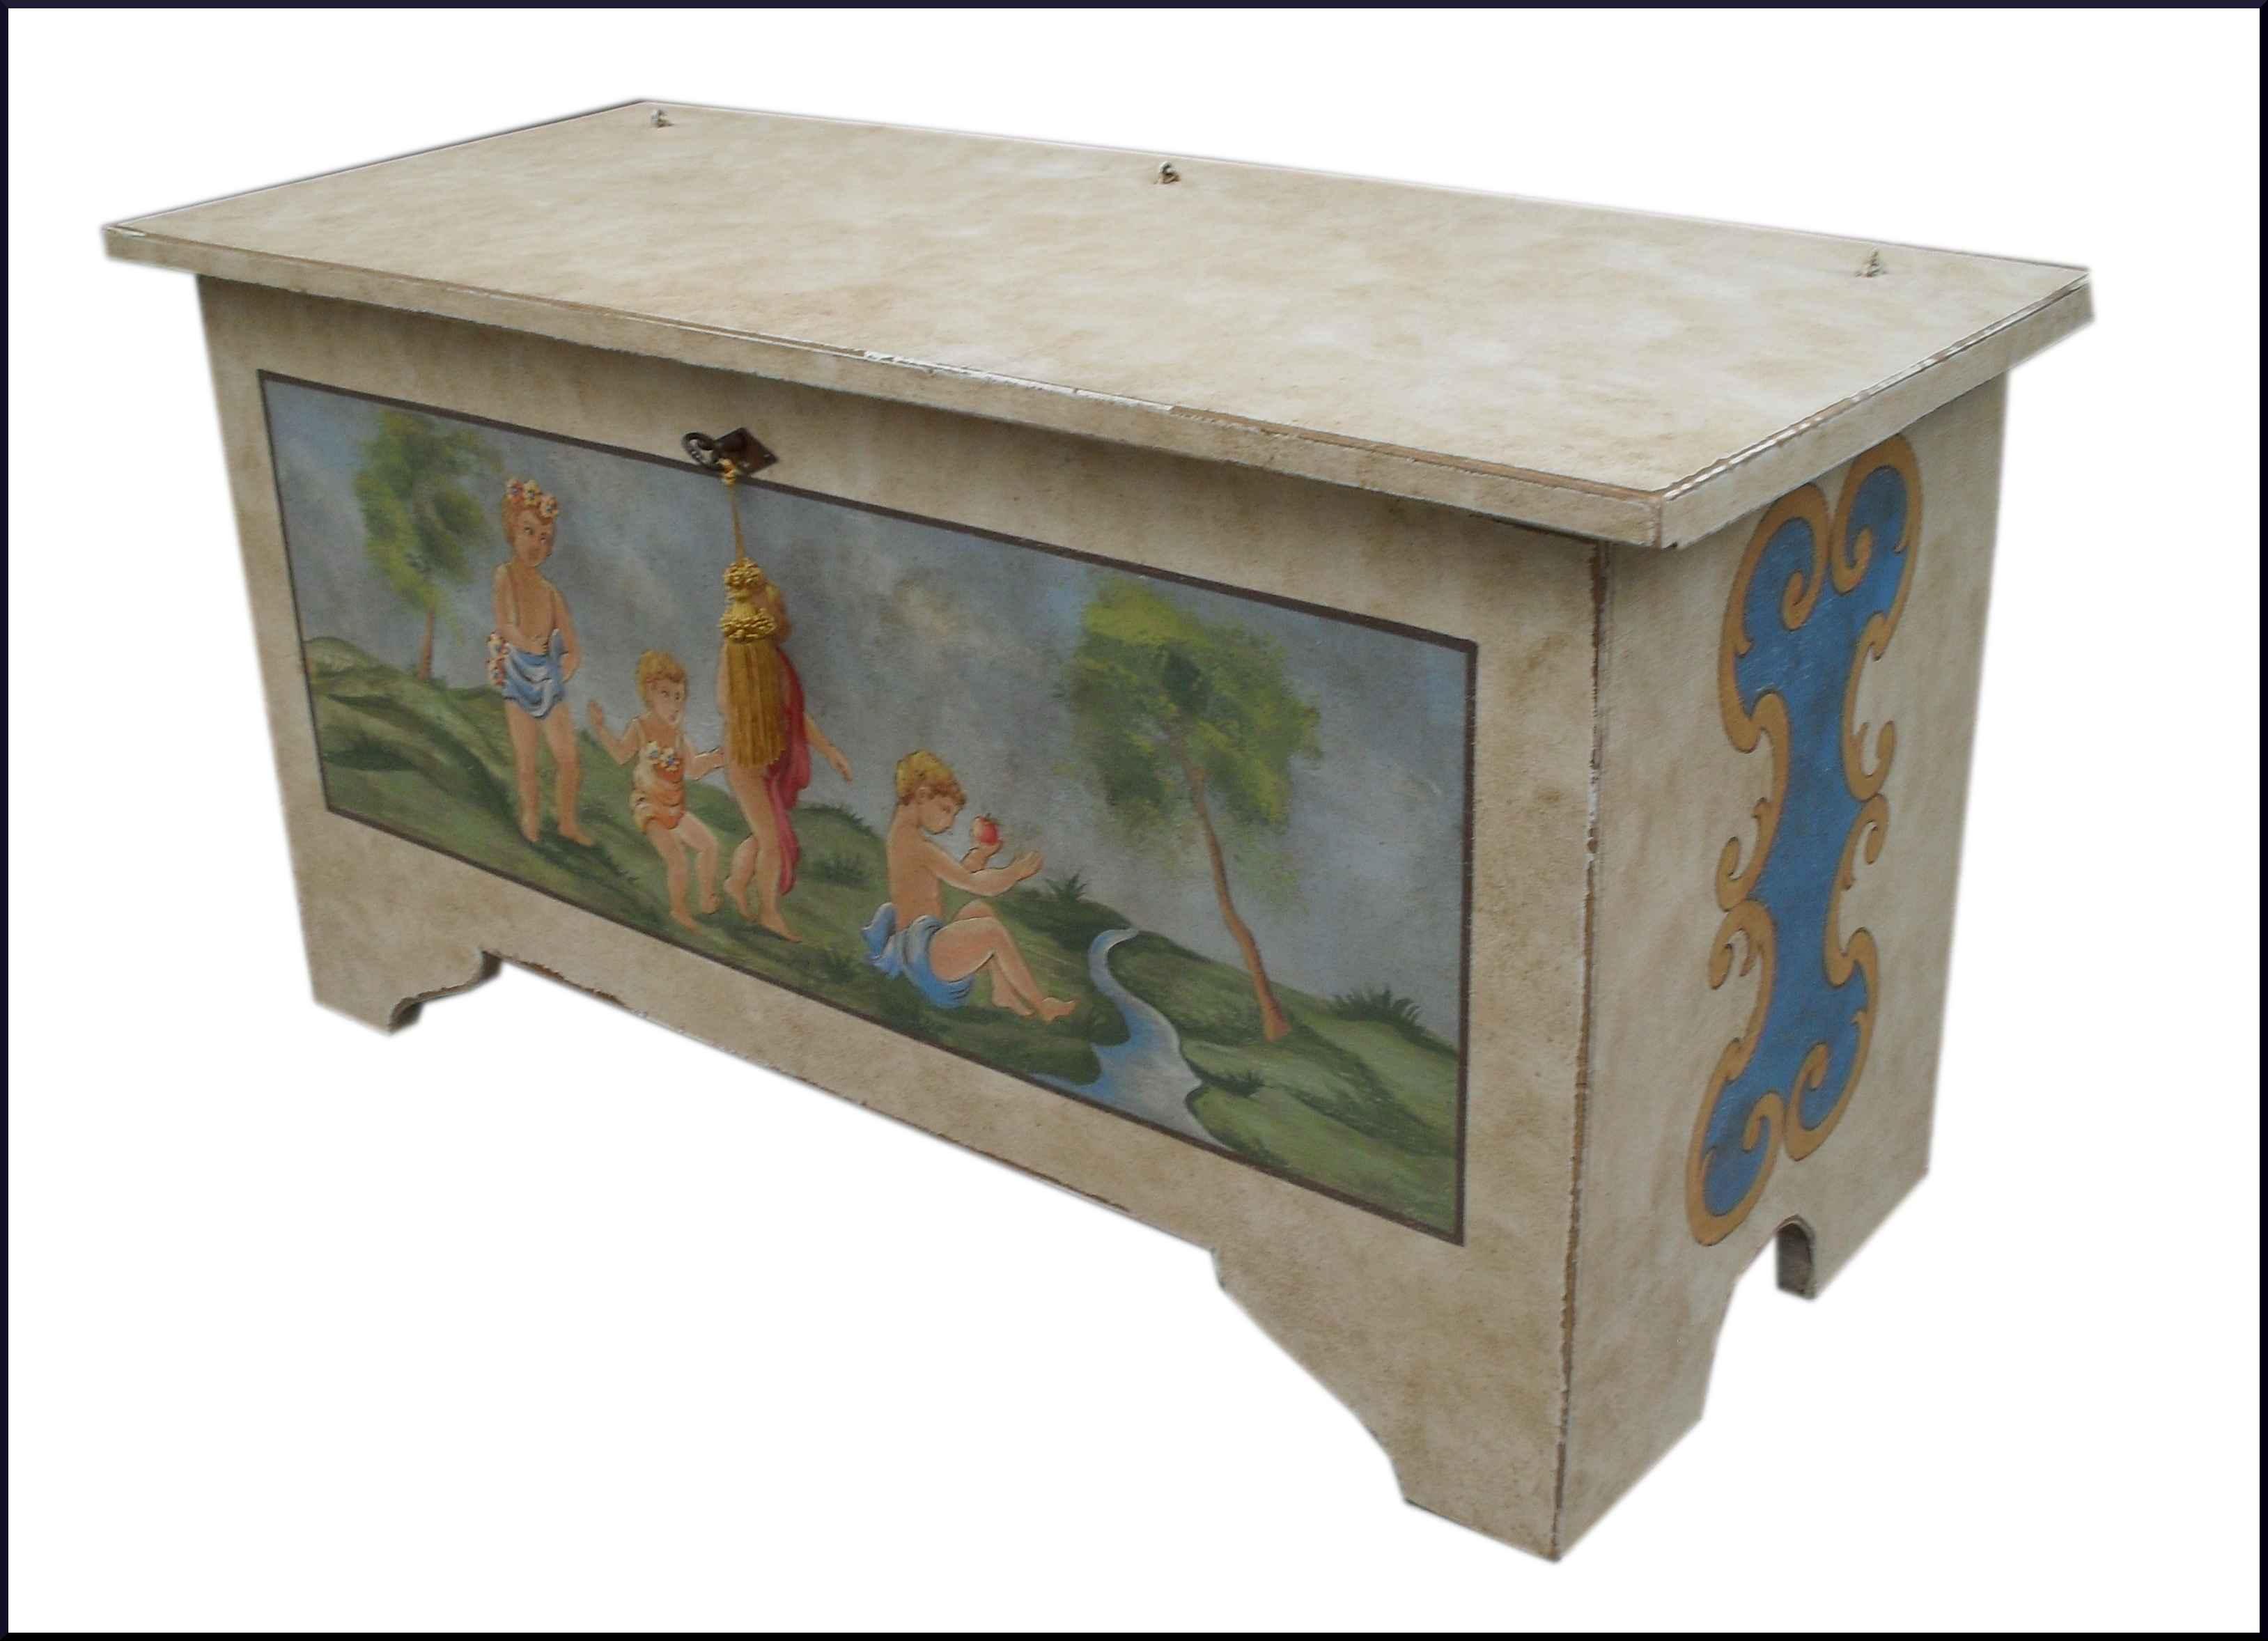 Cassapanca dipinta a mano la commode di davide corno - Cassapanca decorata ...